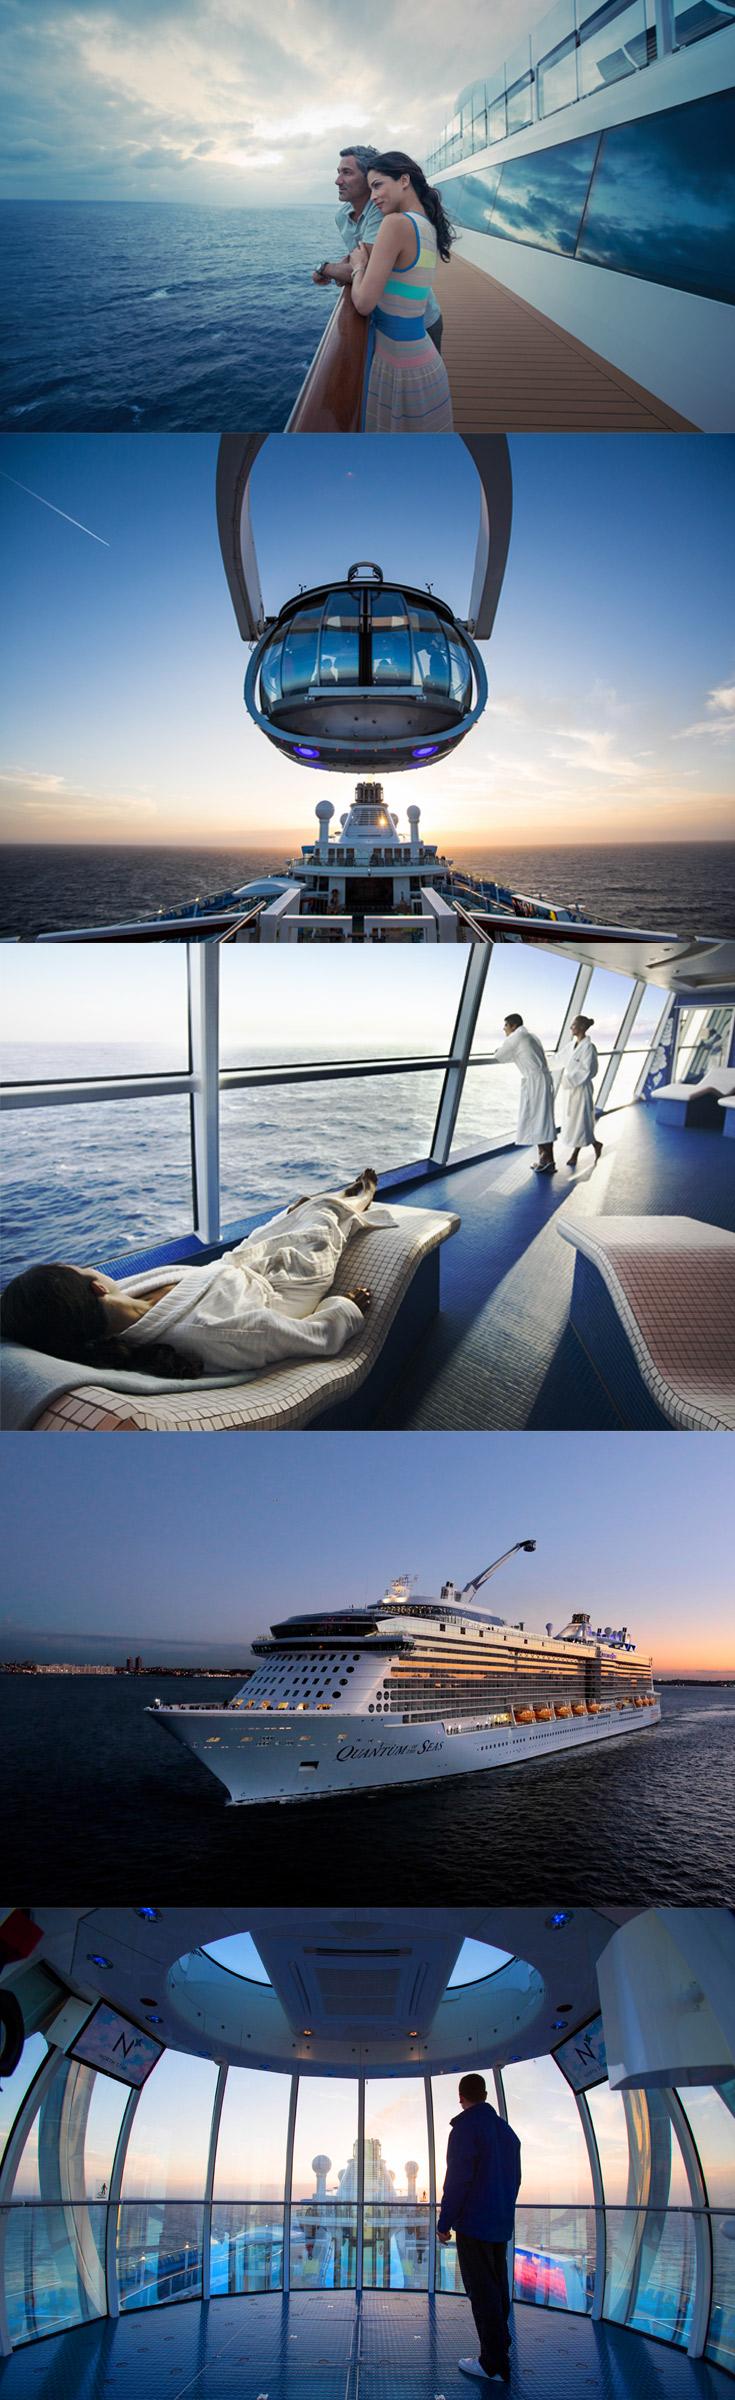 Make Your Next Holiday Destination a Royal Caribbean ...